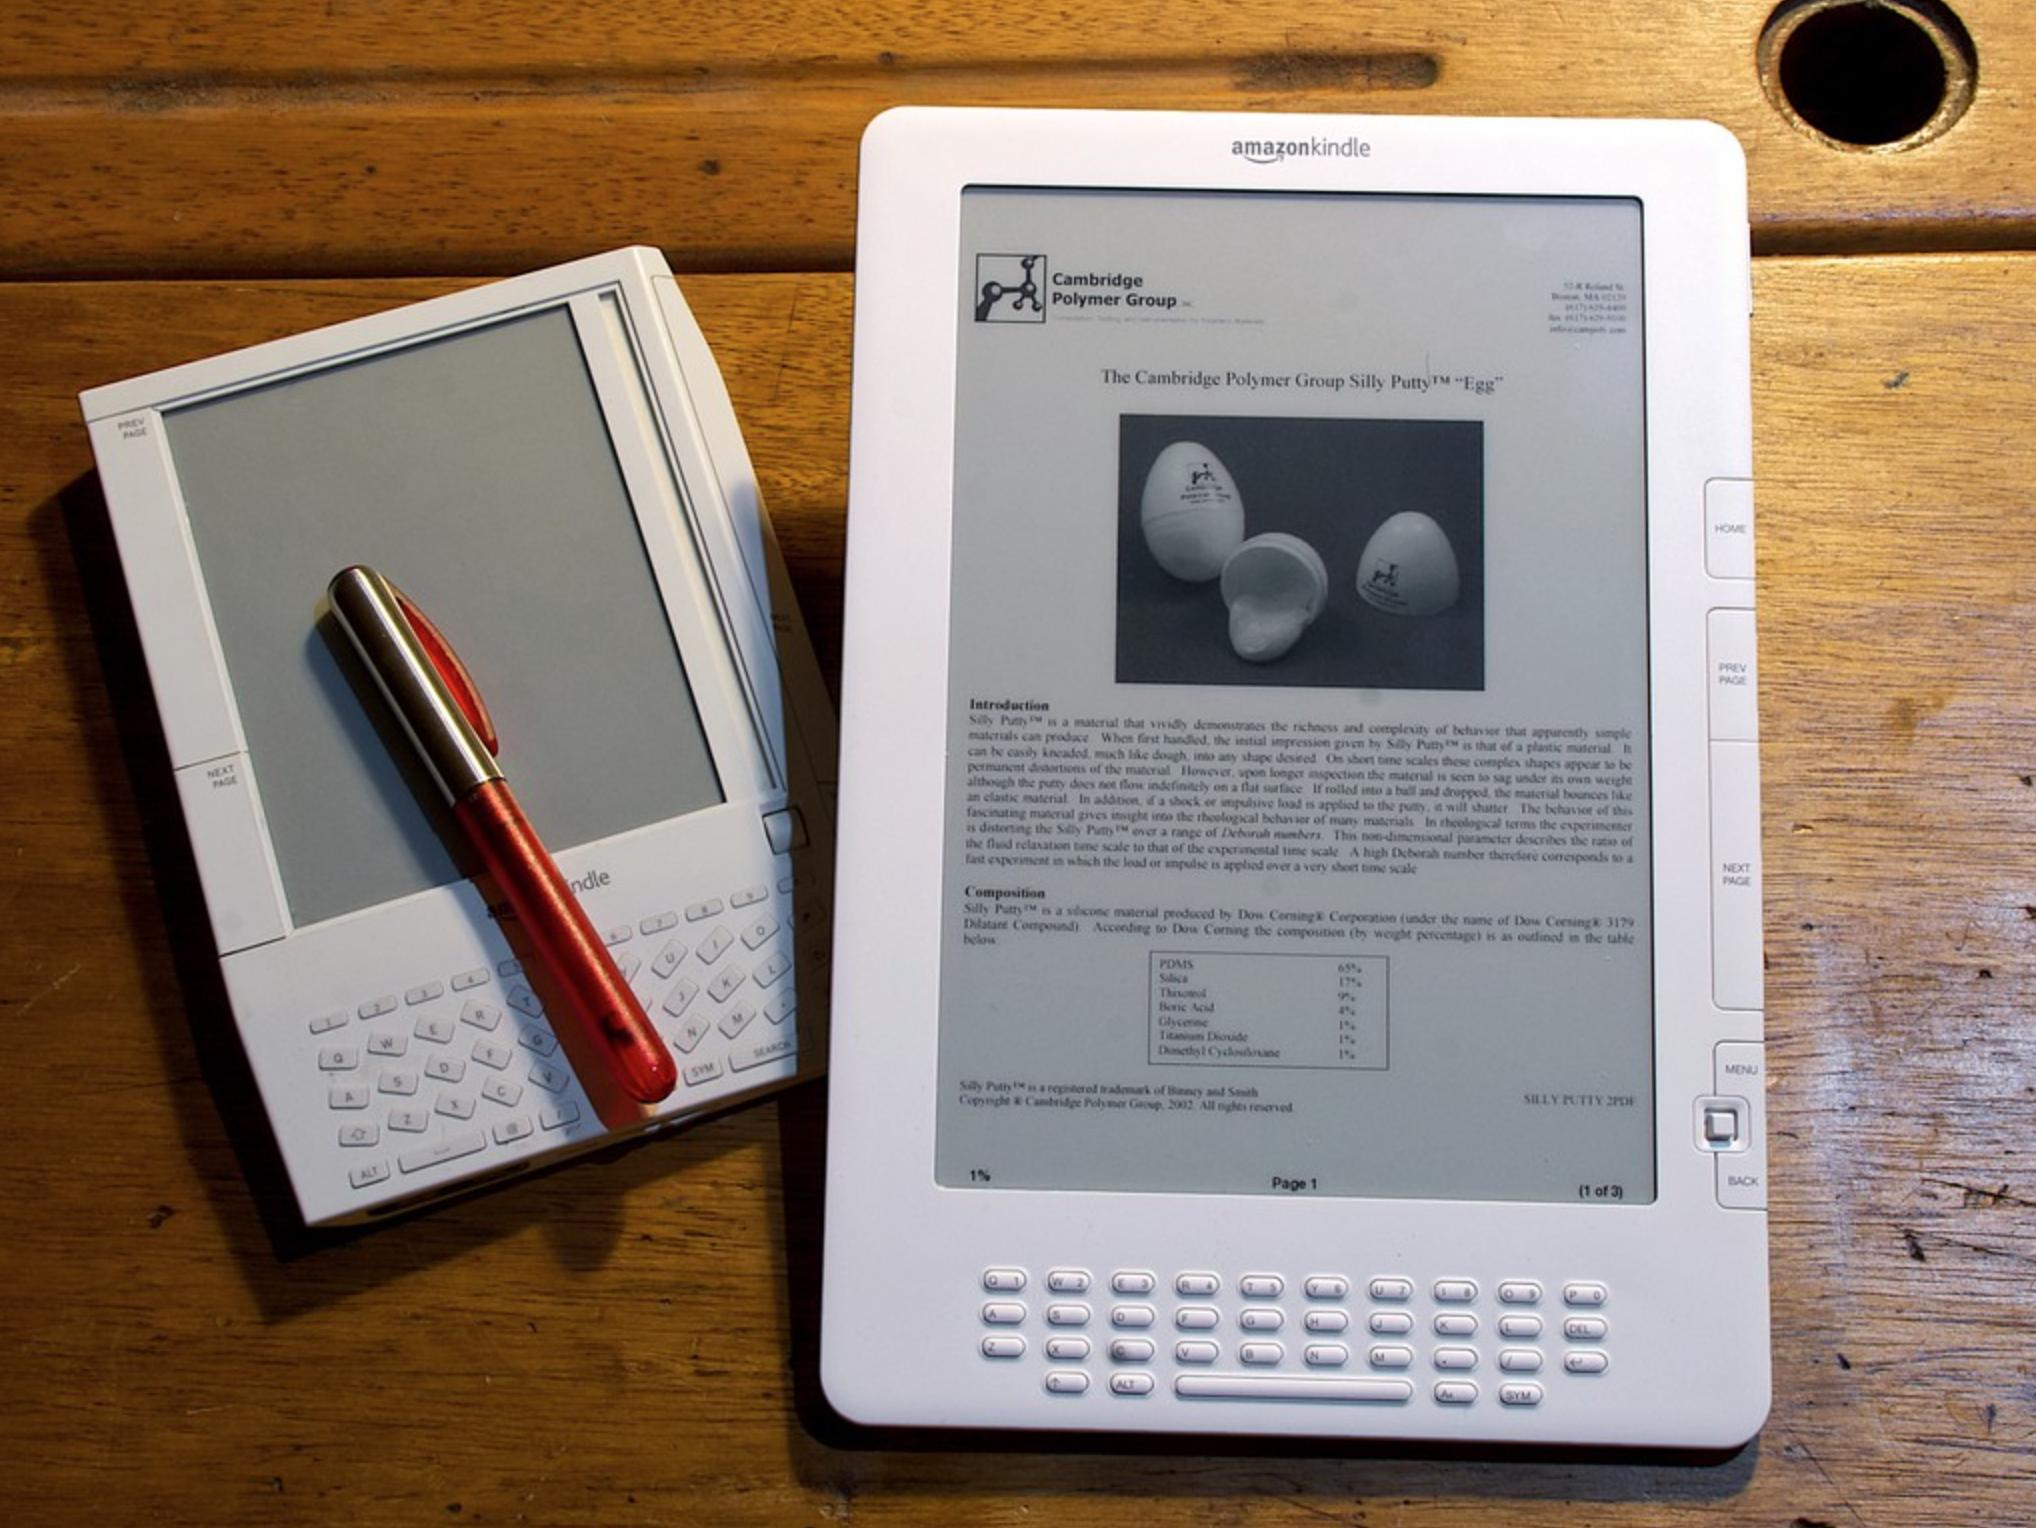 Amazon Kindle. Photo: Andy Ihnatko via Flickr.